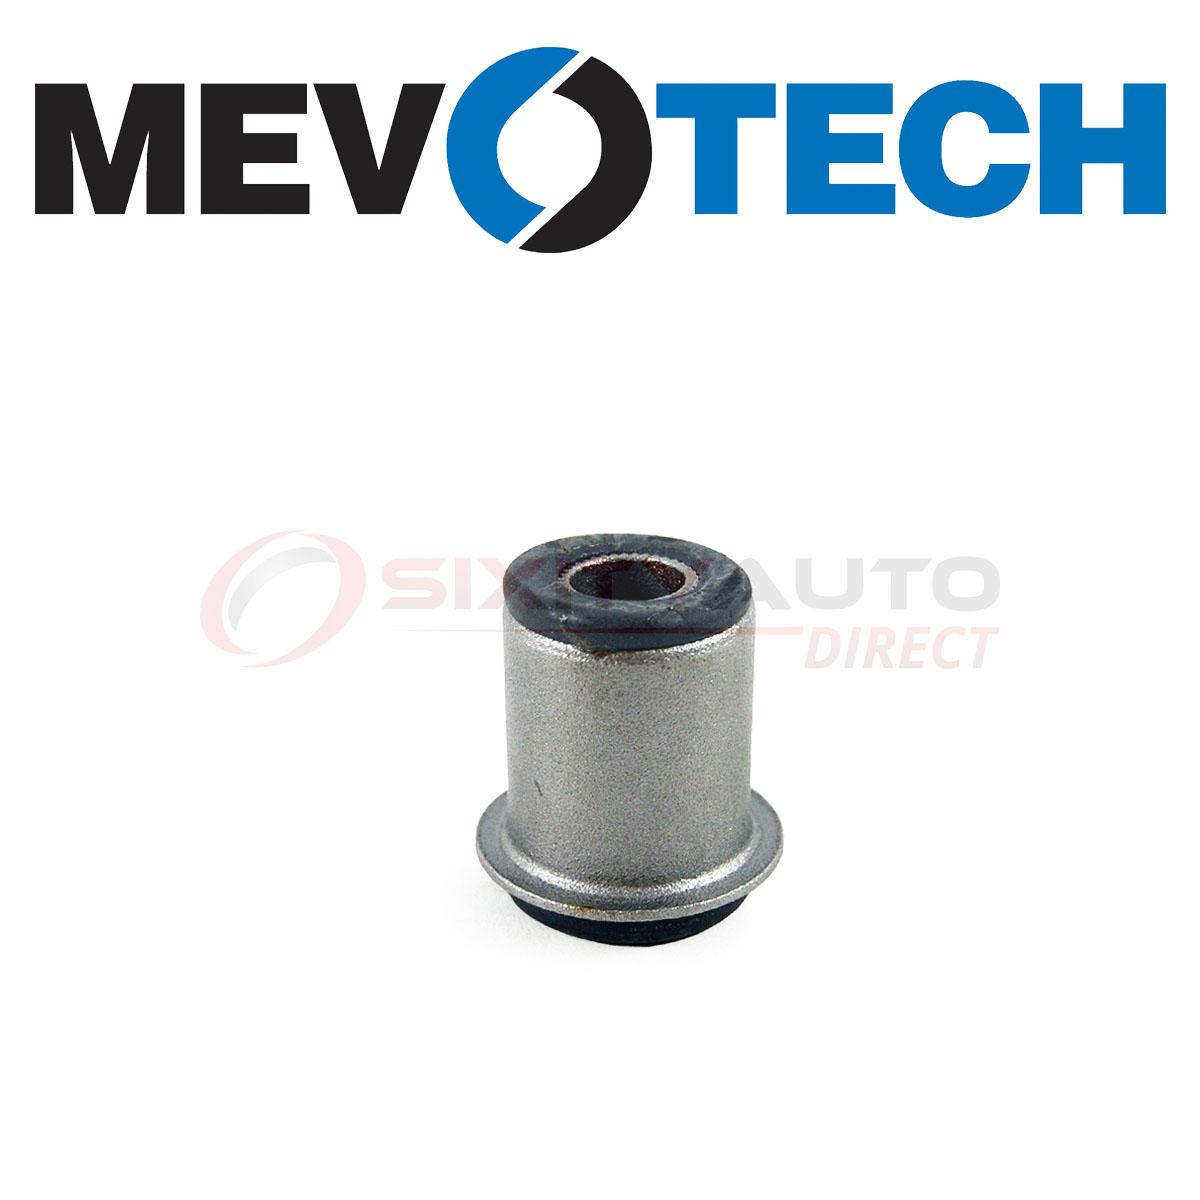 Auto Extra Mevotech MK9098 Idler Arm Bushing